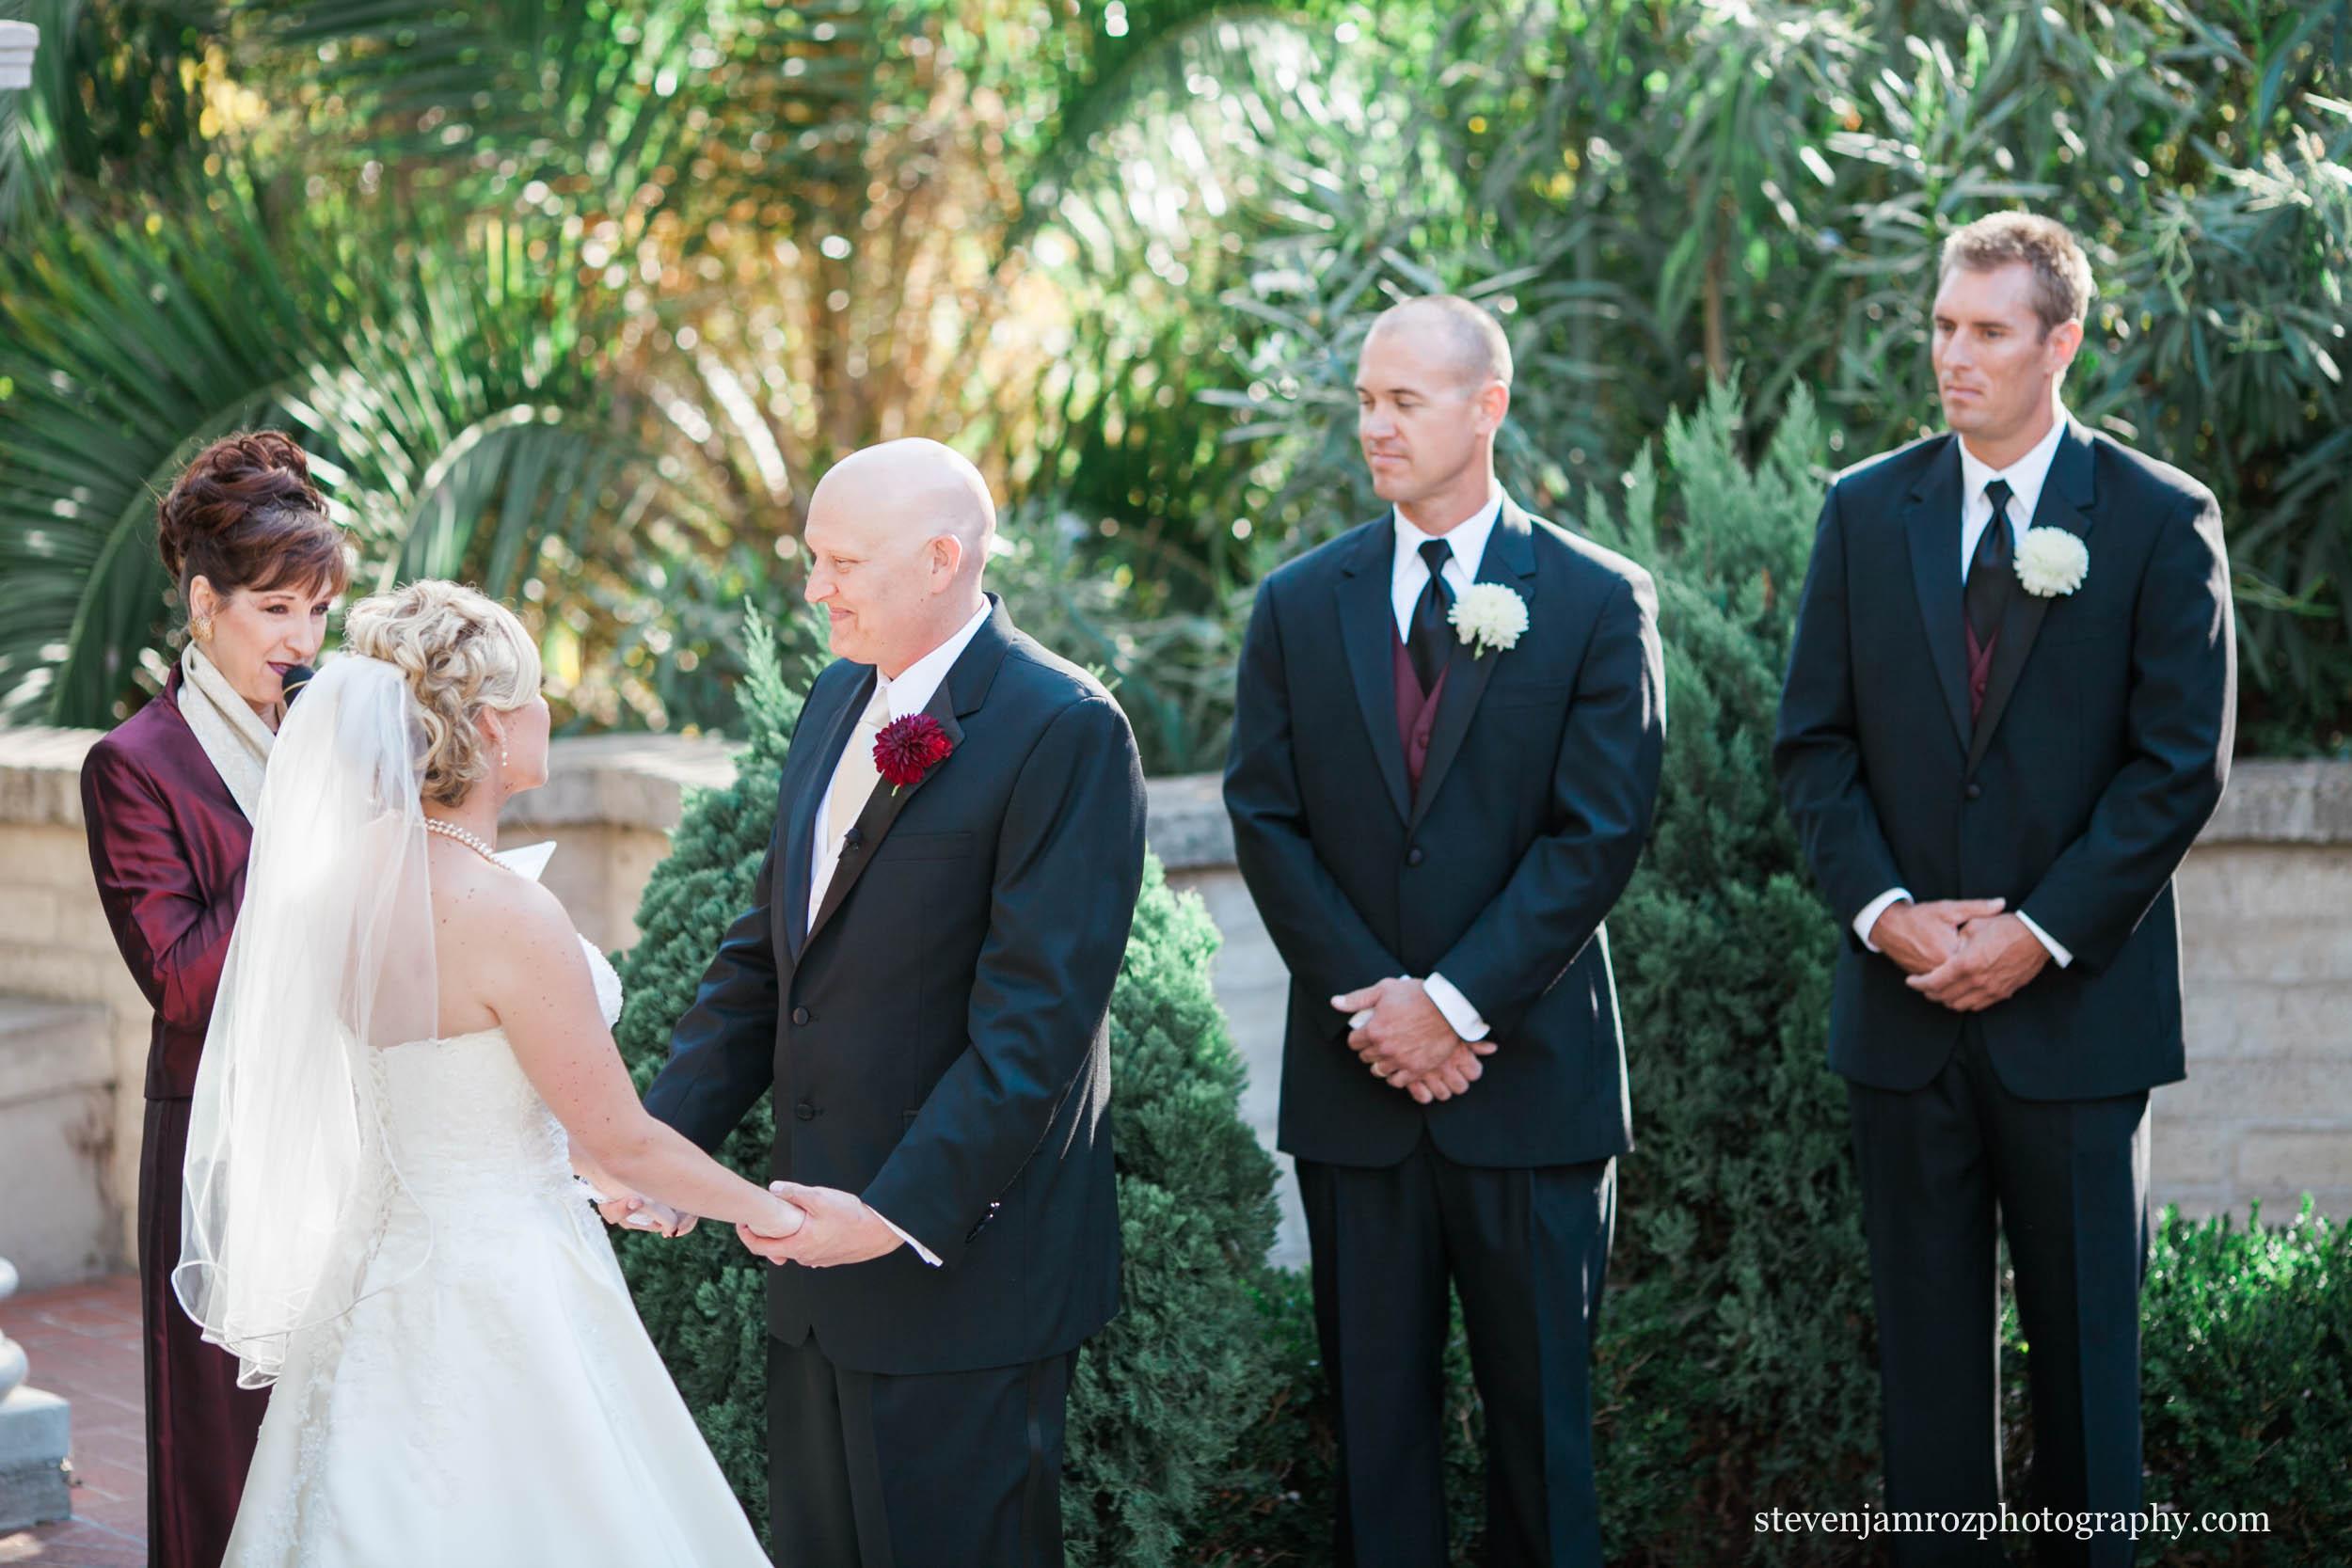 intimate-durham-nc-wedding-ceremony-steven-jamroz-photography-0440.jpg